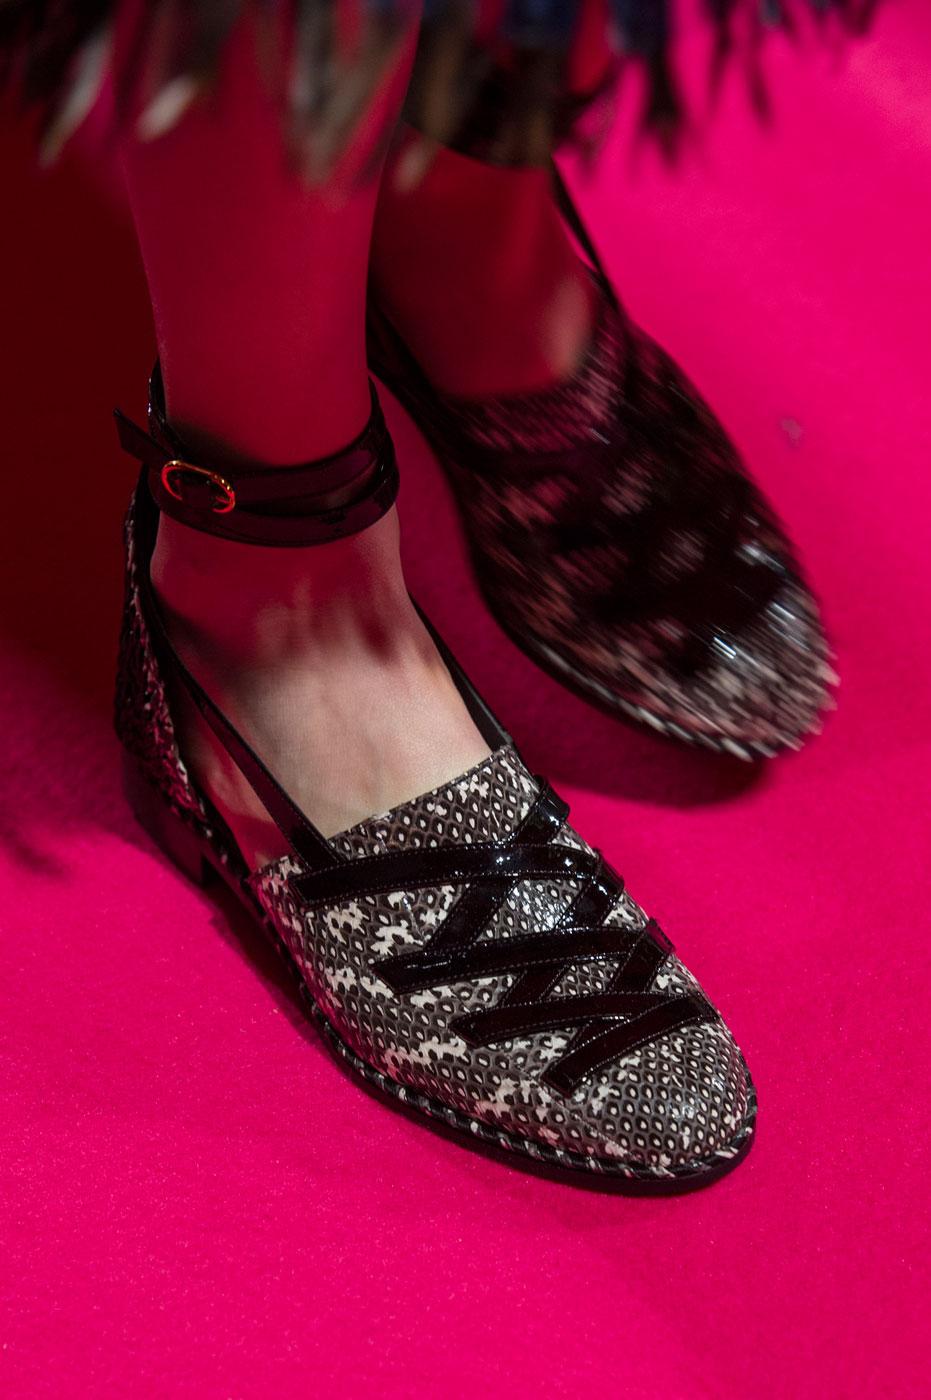 Schiaparelli-fashion-runway-show-close-ups-haute-couture-paris-spring-summer-2015-the-impression-62